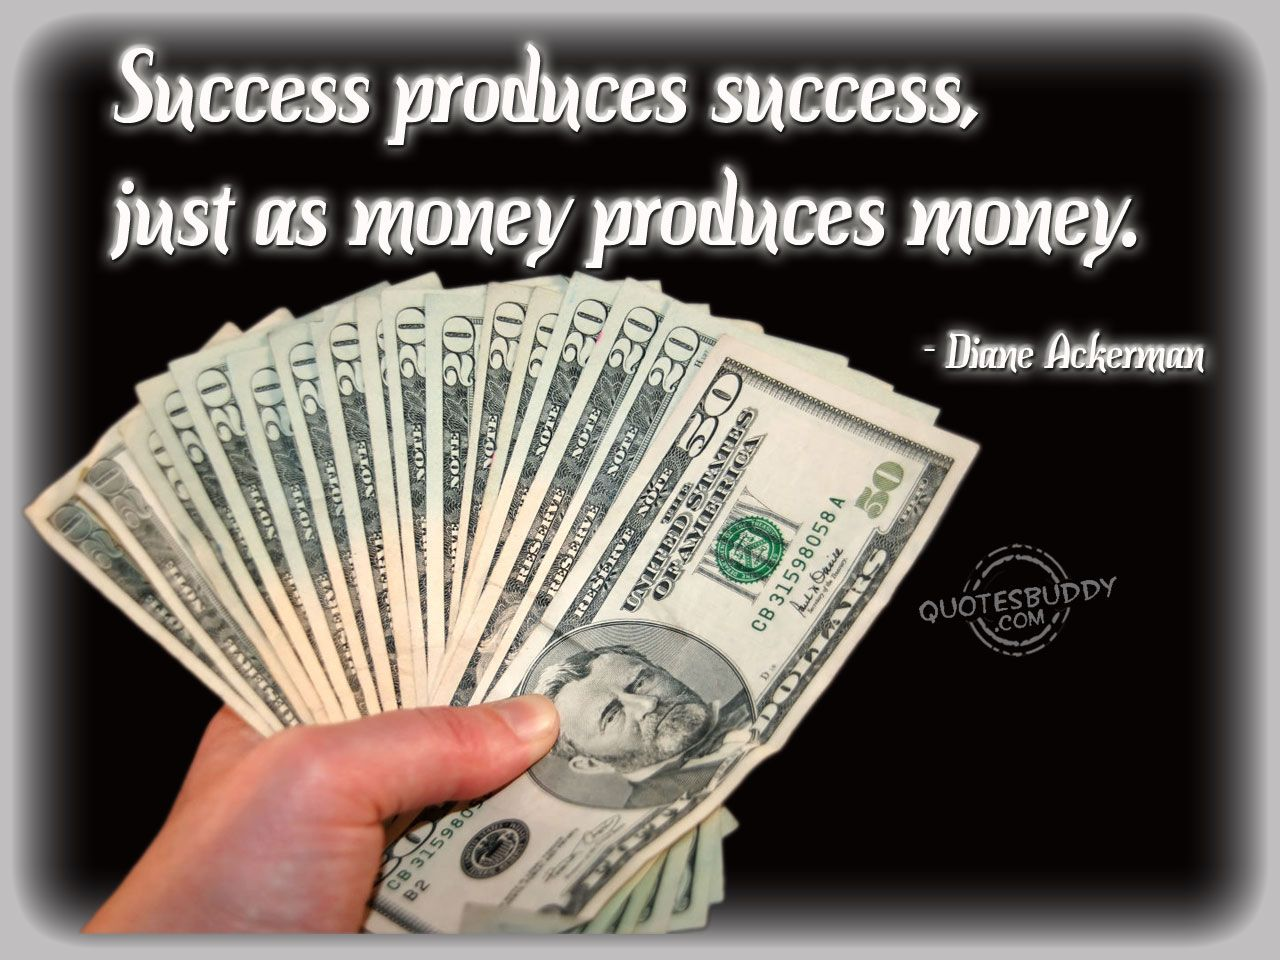 Get Money Quotes Money Quotes Funny .money Quotes Money Quotes Money Quotes